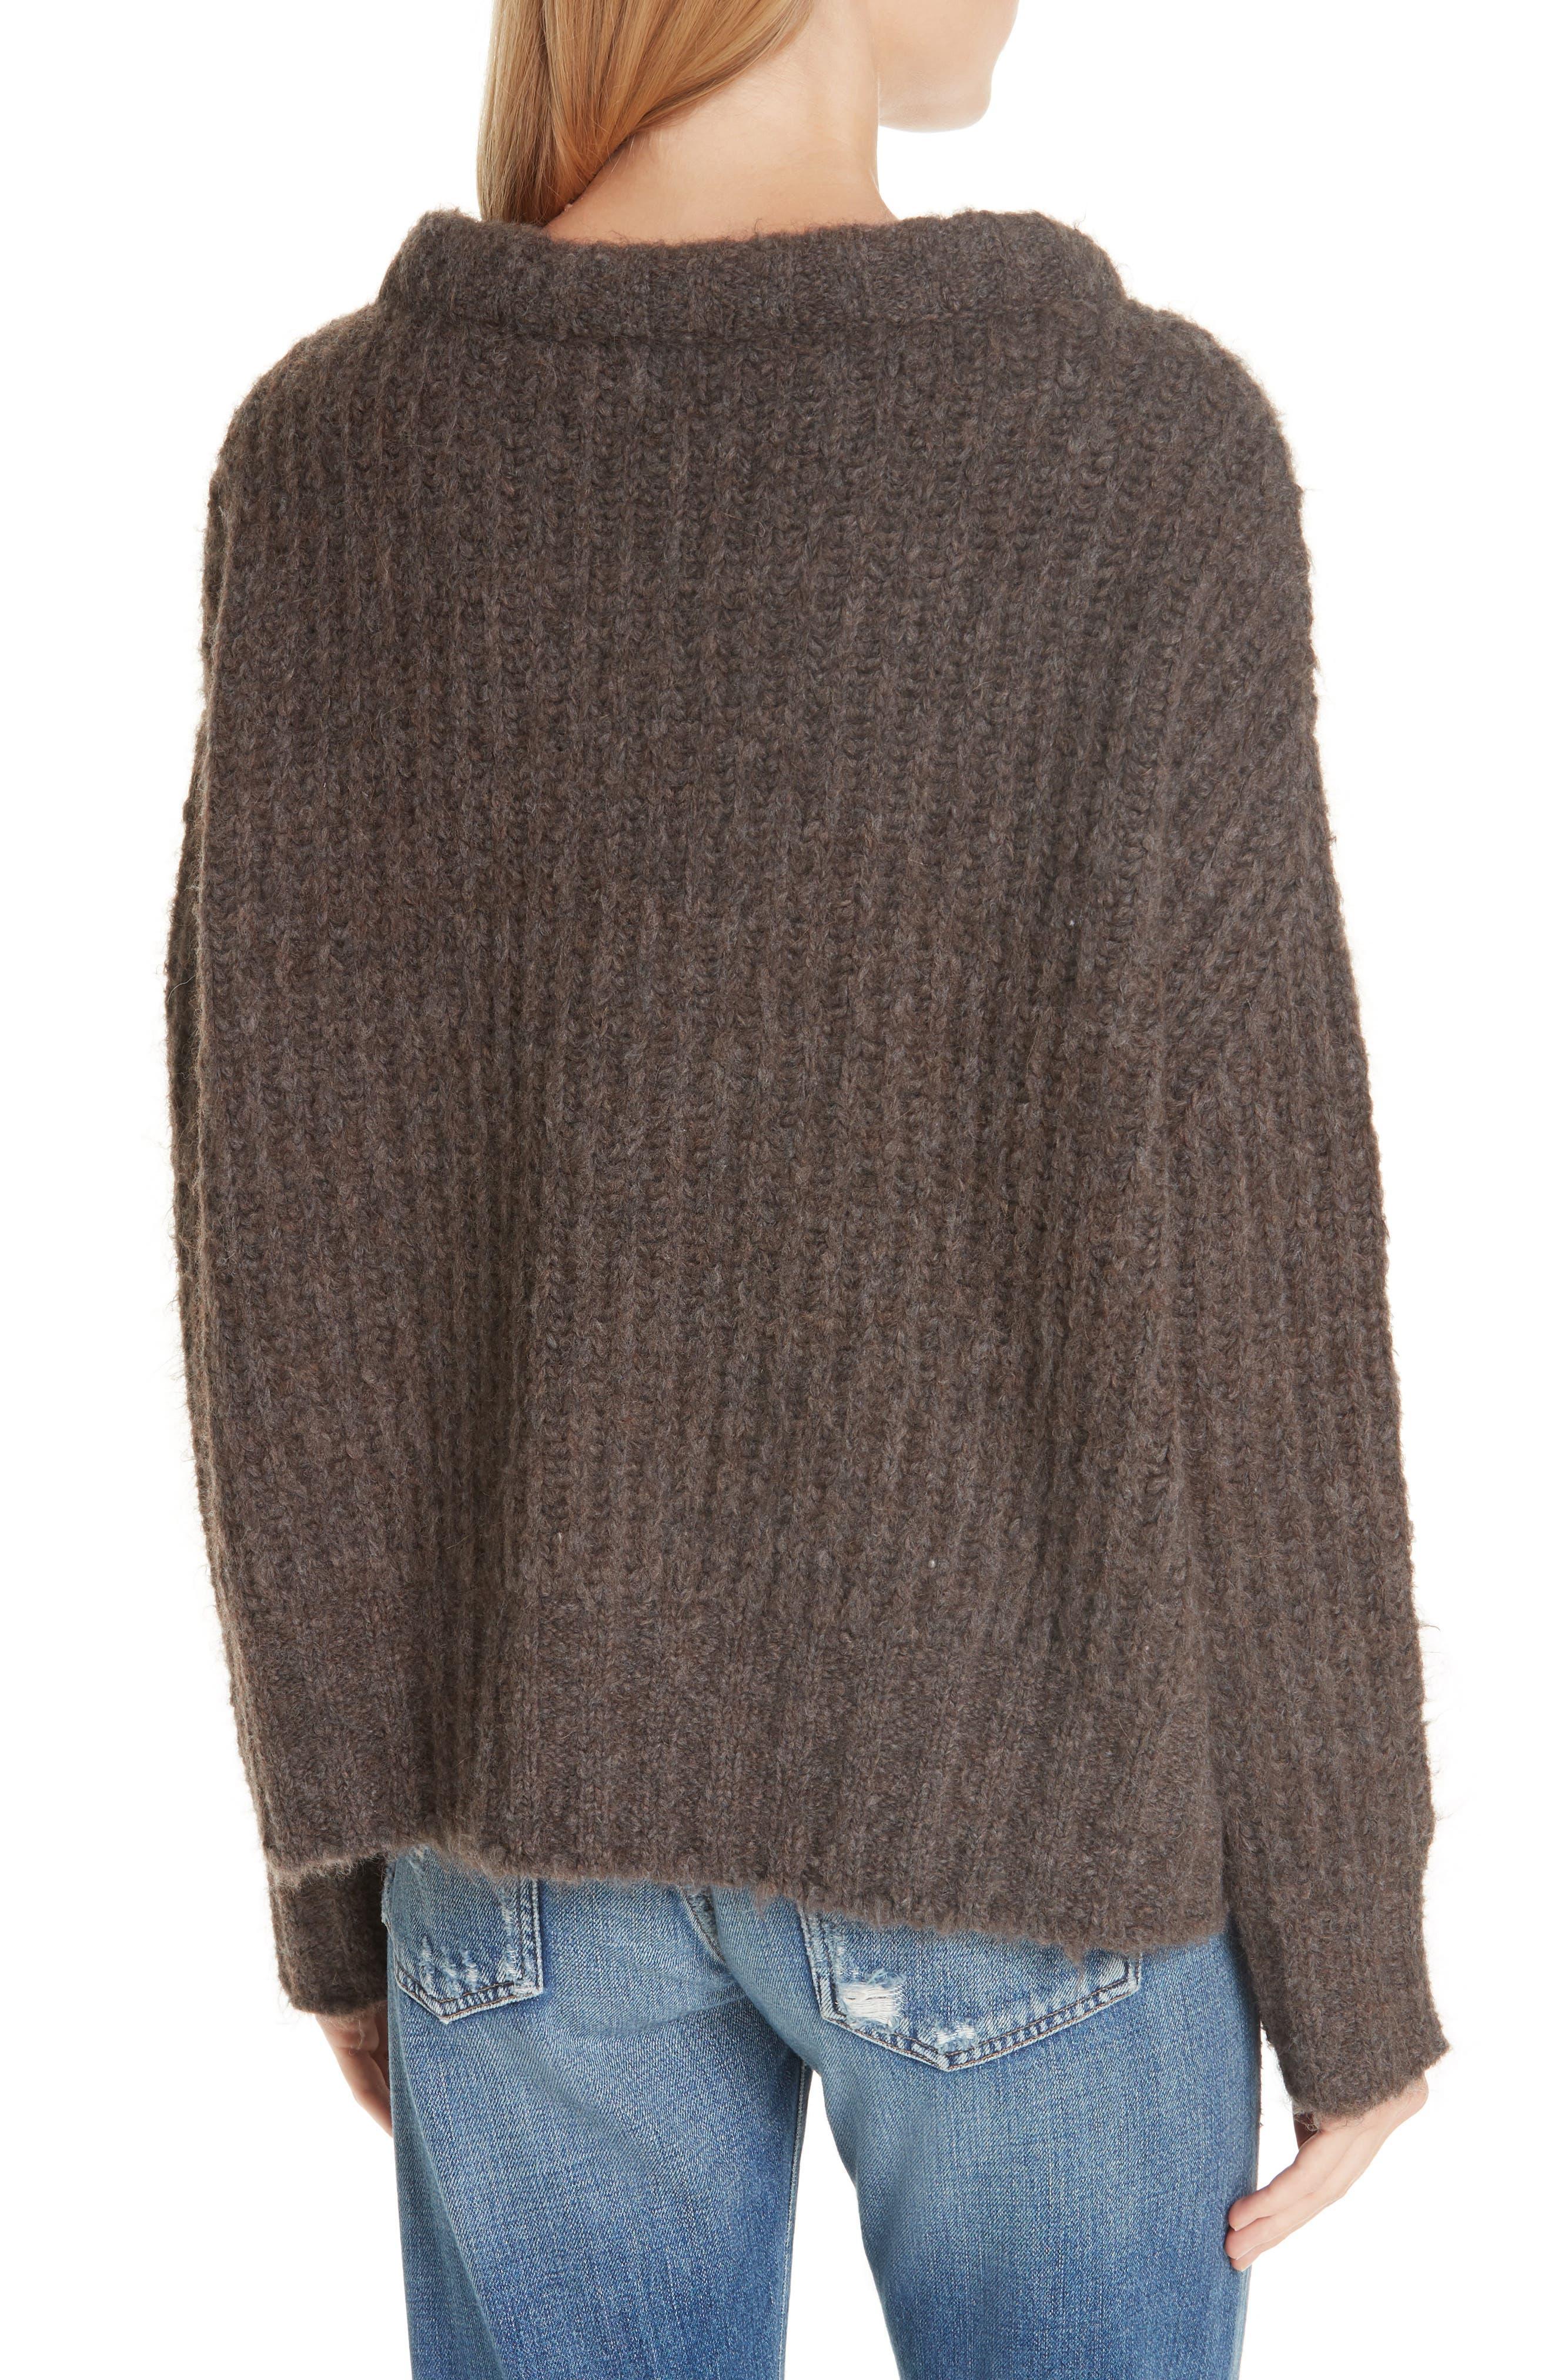 Fabiana Boxy Sweater,                             Alternate thumbnail 2, color,                             230